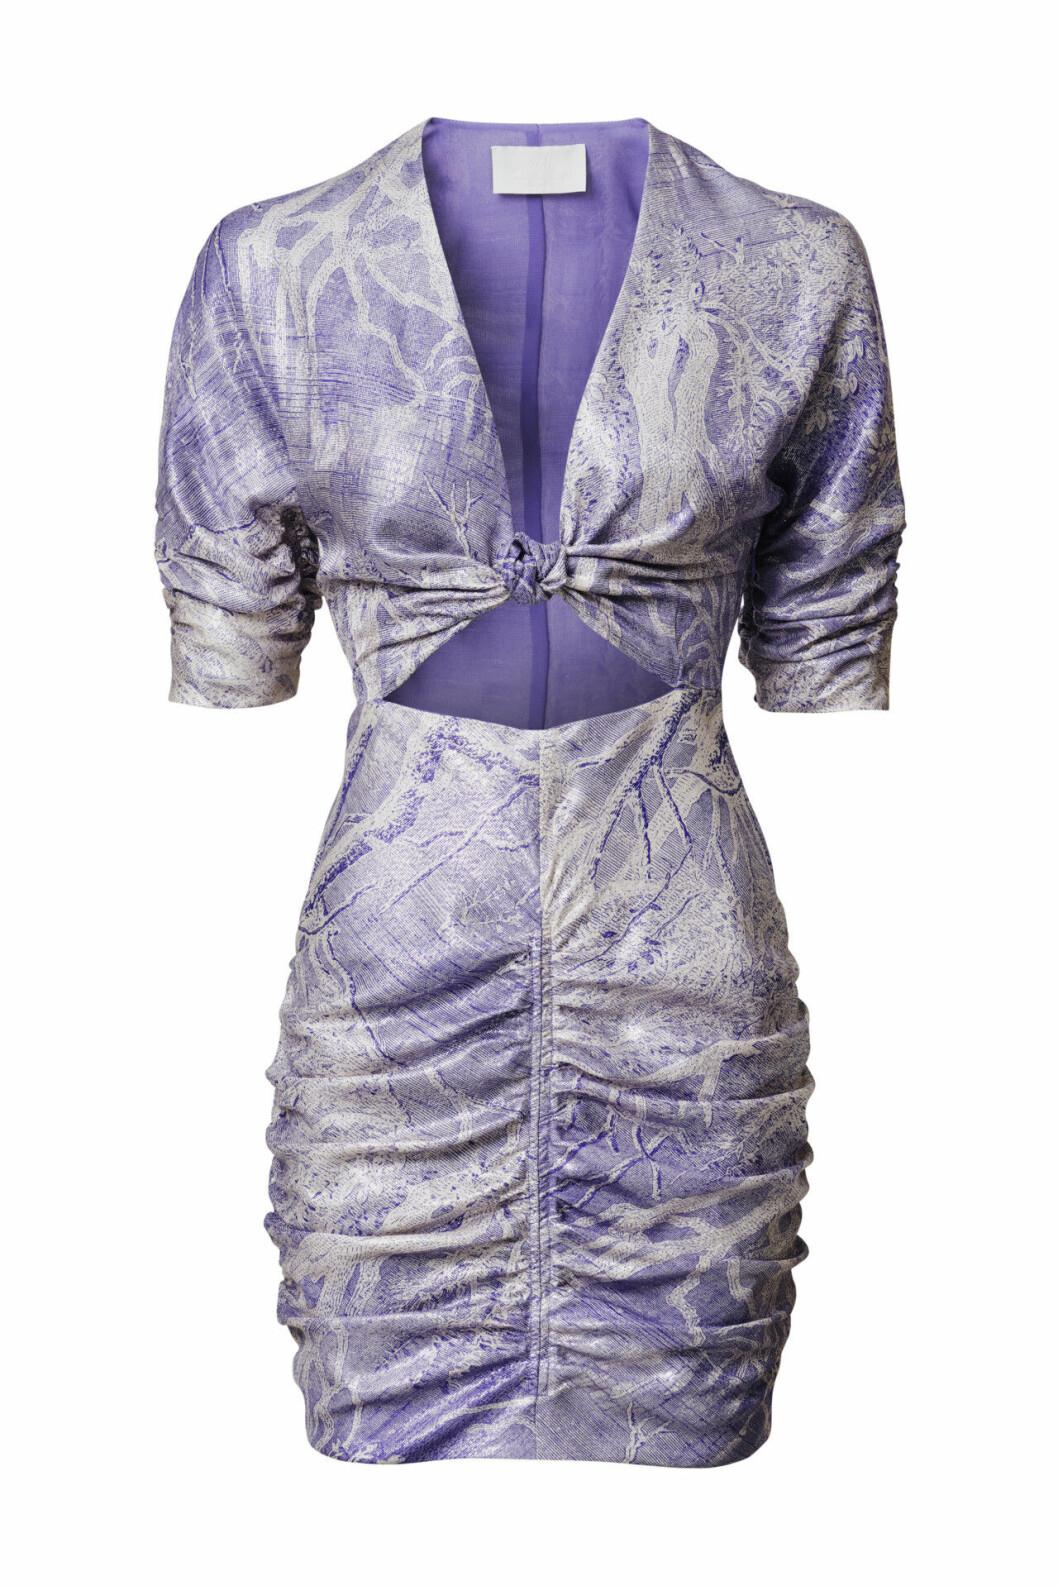 H&M Conscious Exclusive 2019 lila klänning i kort modell